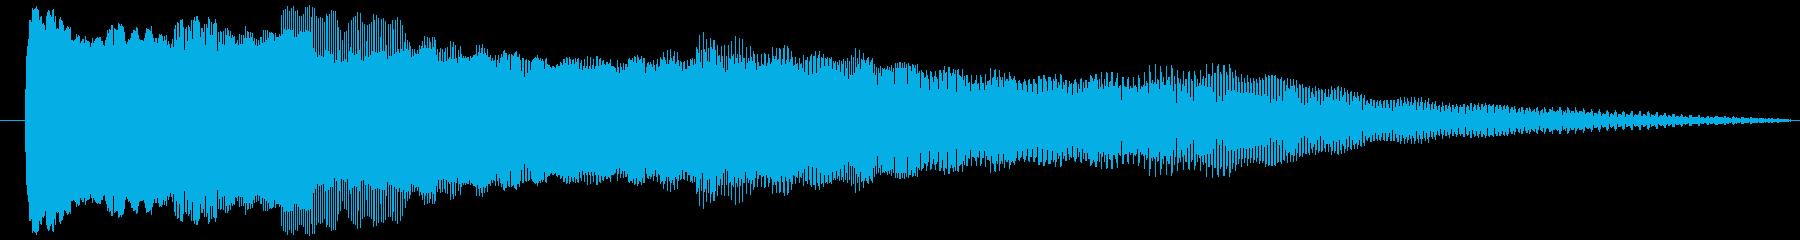 OLDPOWERバージョン2の再生済みの波形